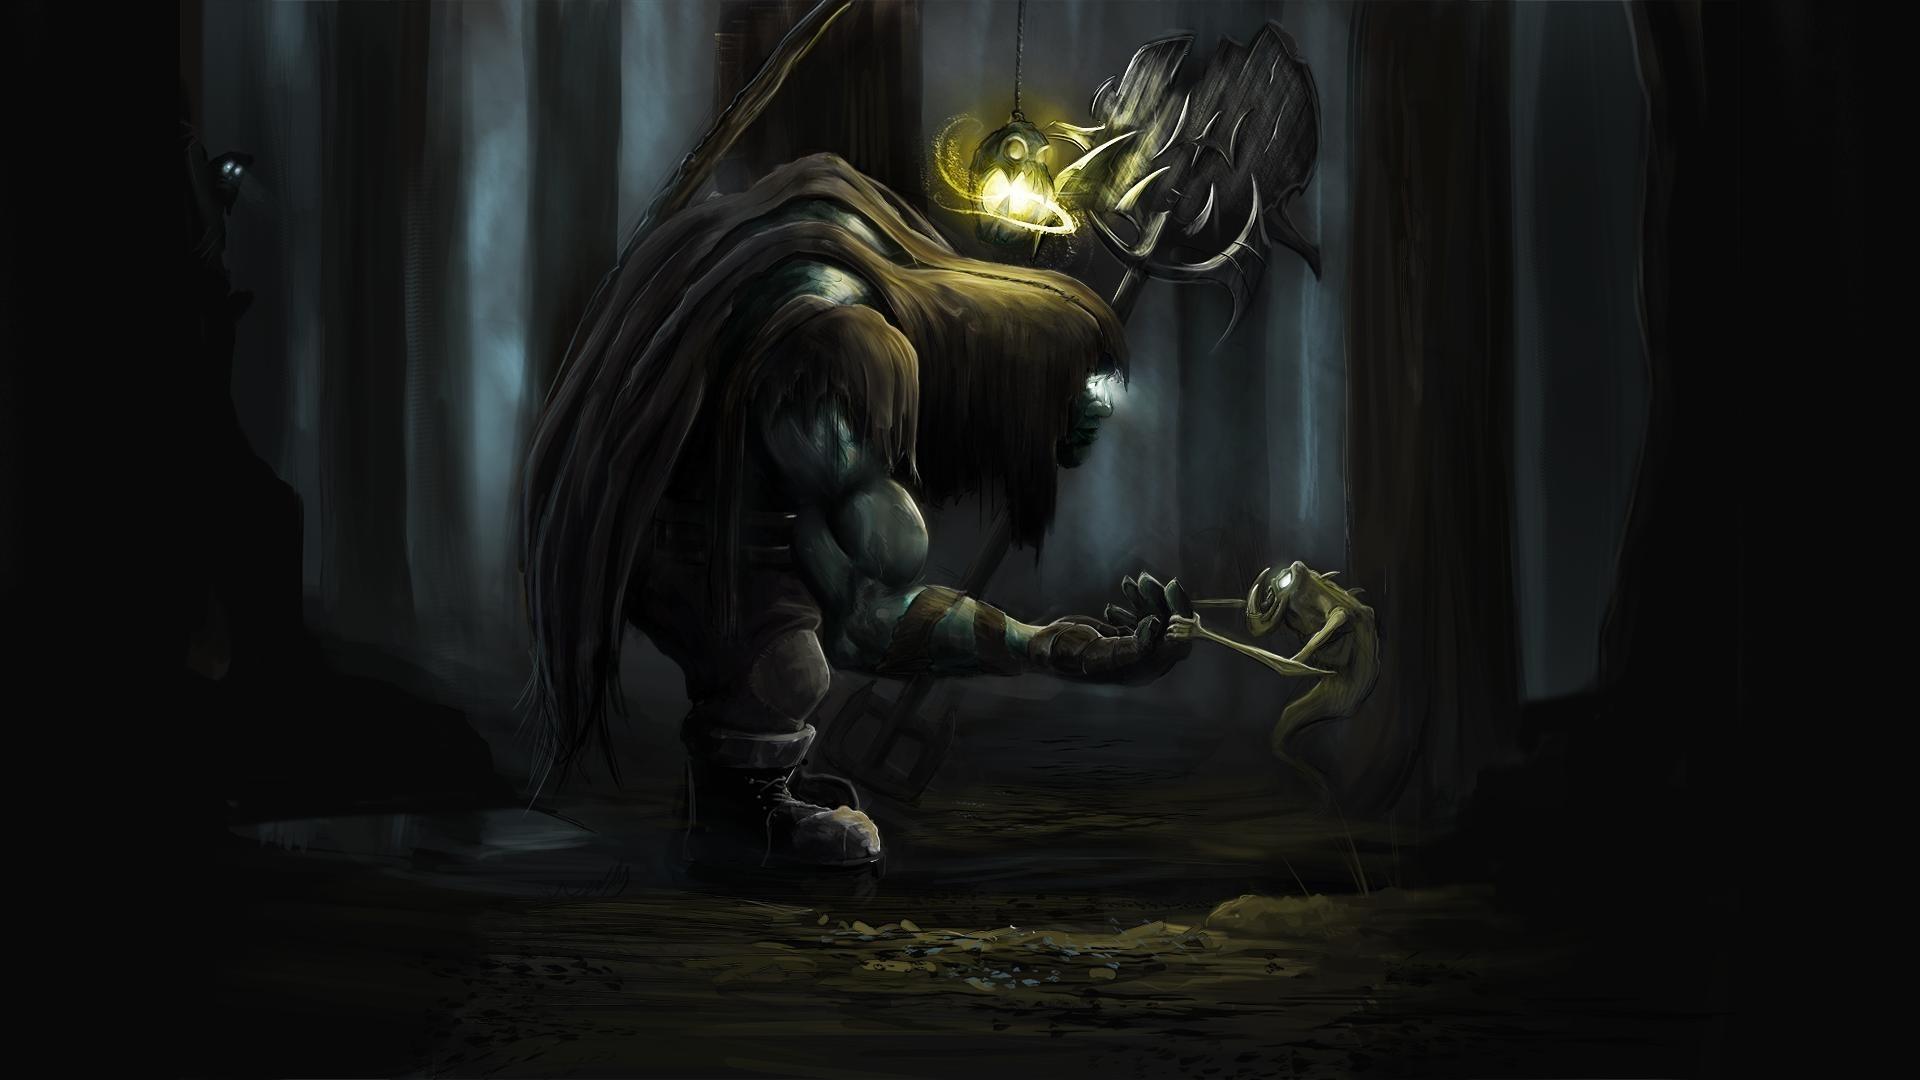 dark creatures   Yorick League of Legends fantasy dark monsters creatures  scary trees .